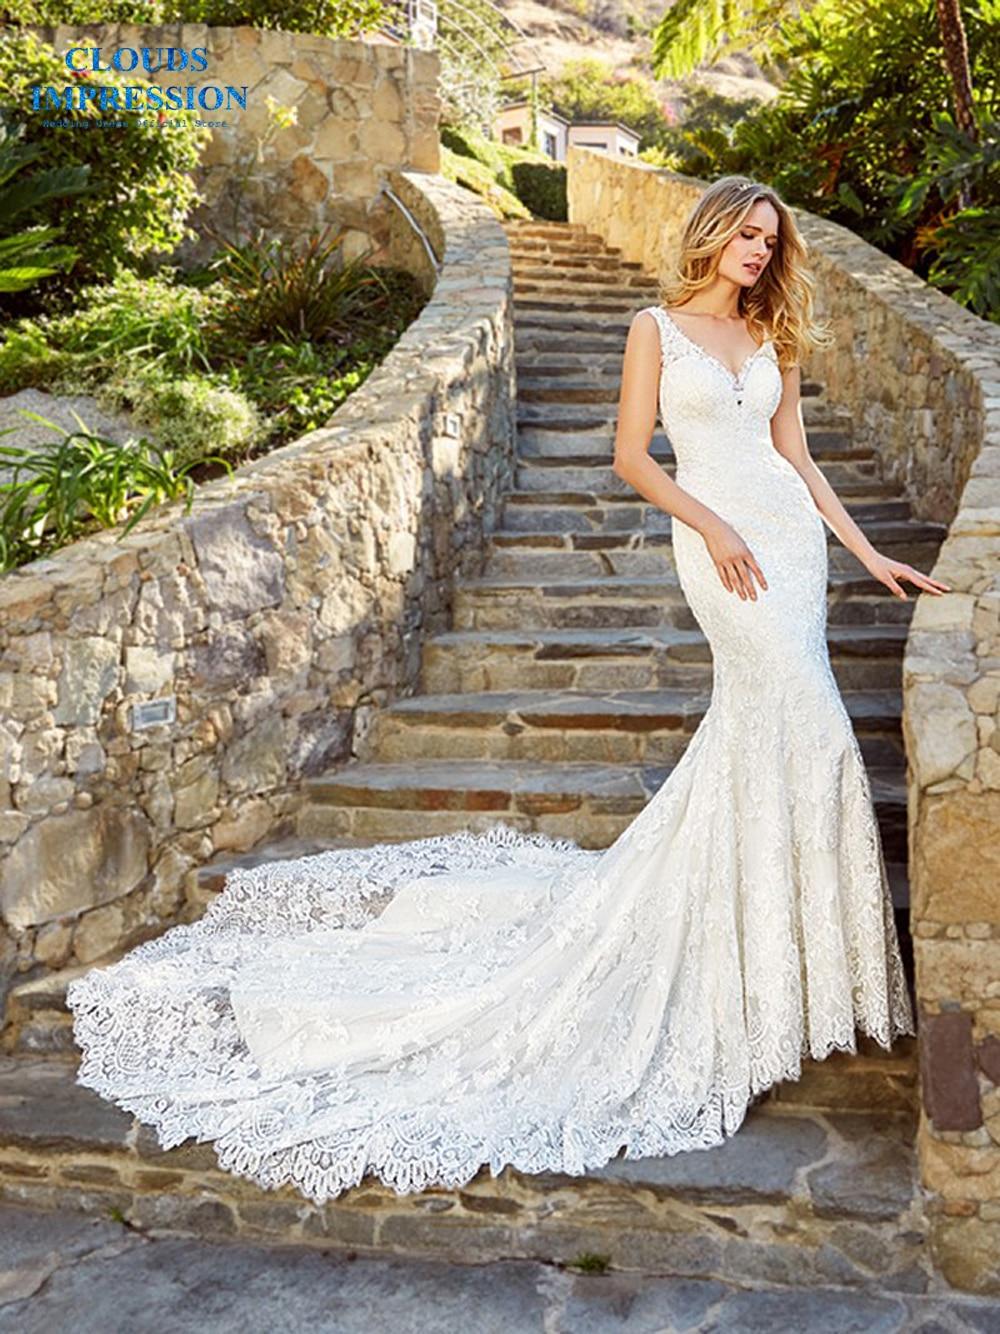 CLOUDS IMPRESSION Sexy V neck 2019 Lace Mermaid Wedding Dress Button Illusion Vestige De Noiva Bridal